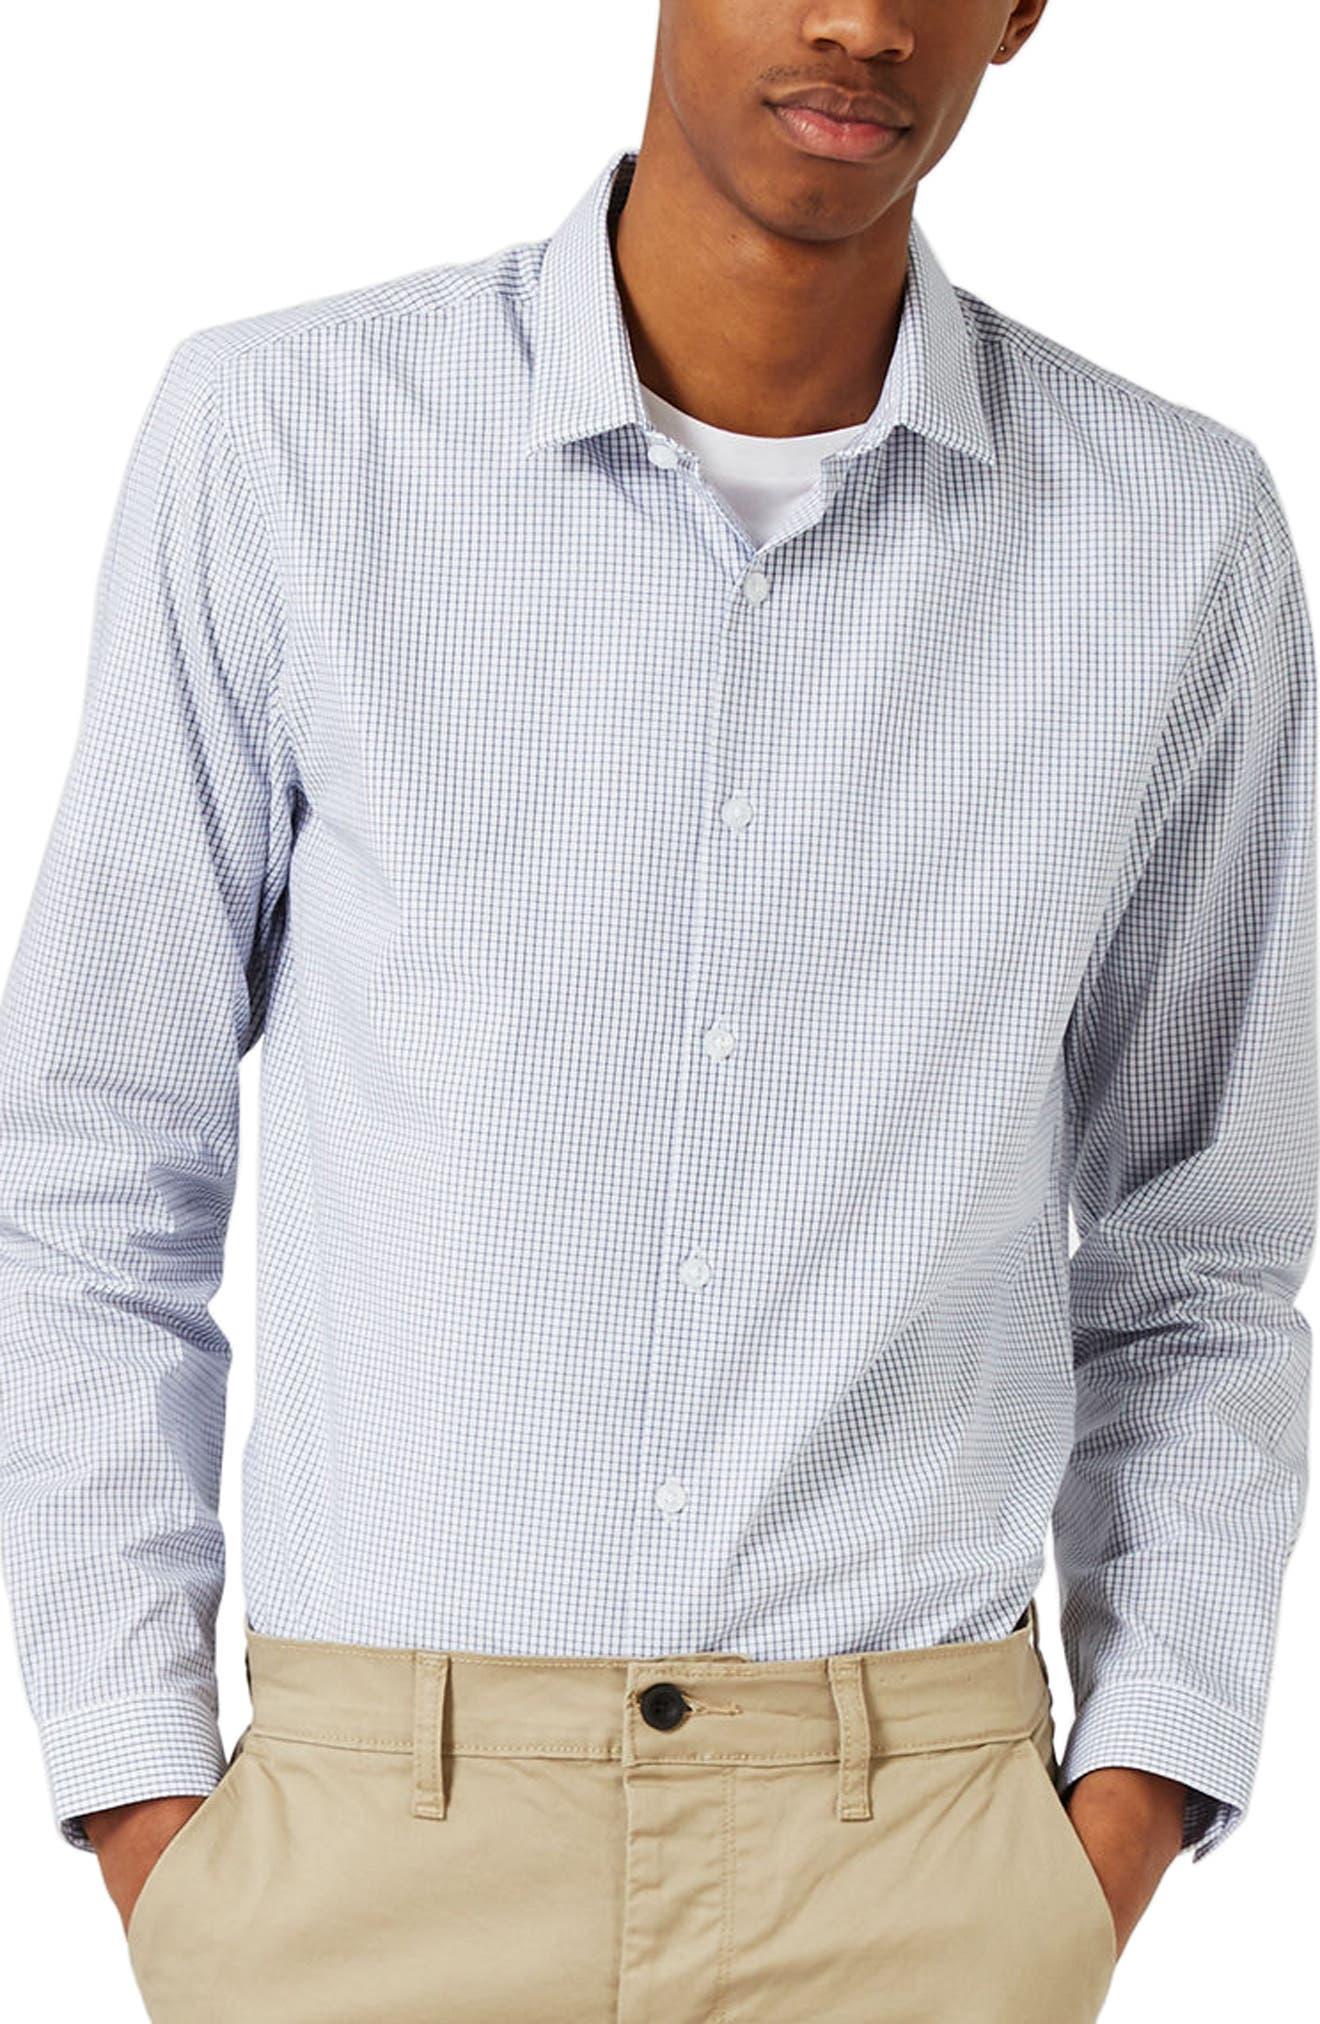 Slim Fit Grid Check Dress Shirt,                         Main,                         color, White/ Blue